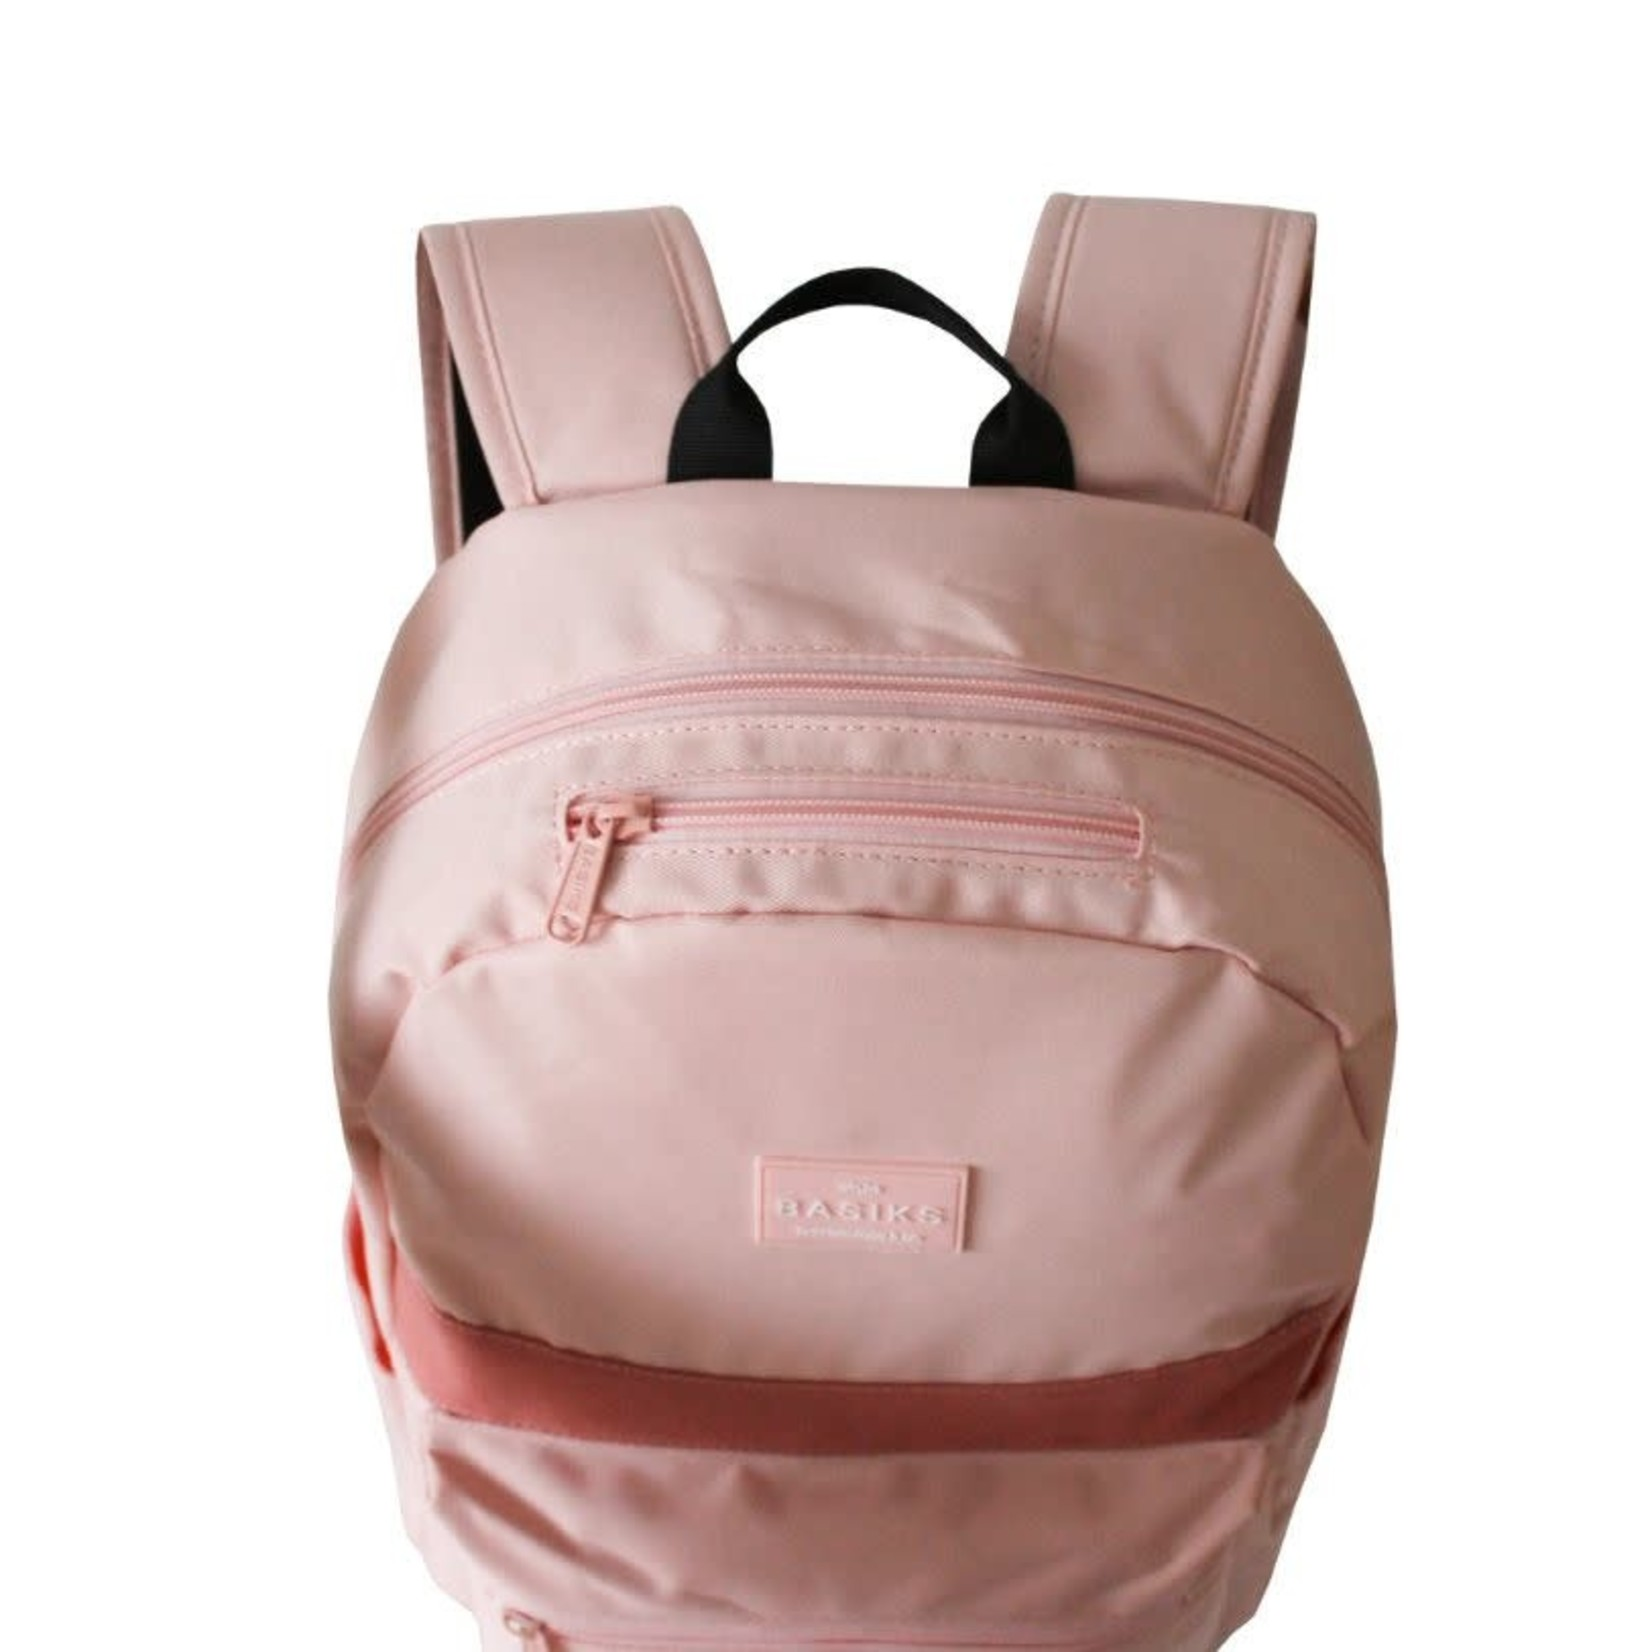 Basiks.Co Basiks.Co : Origin Backpack Light Pink,O/S